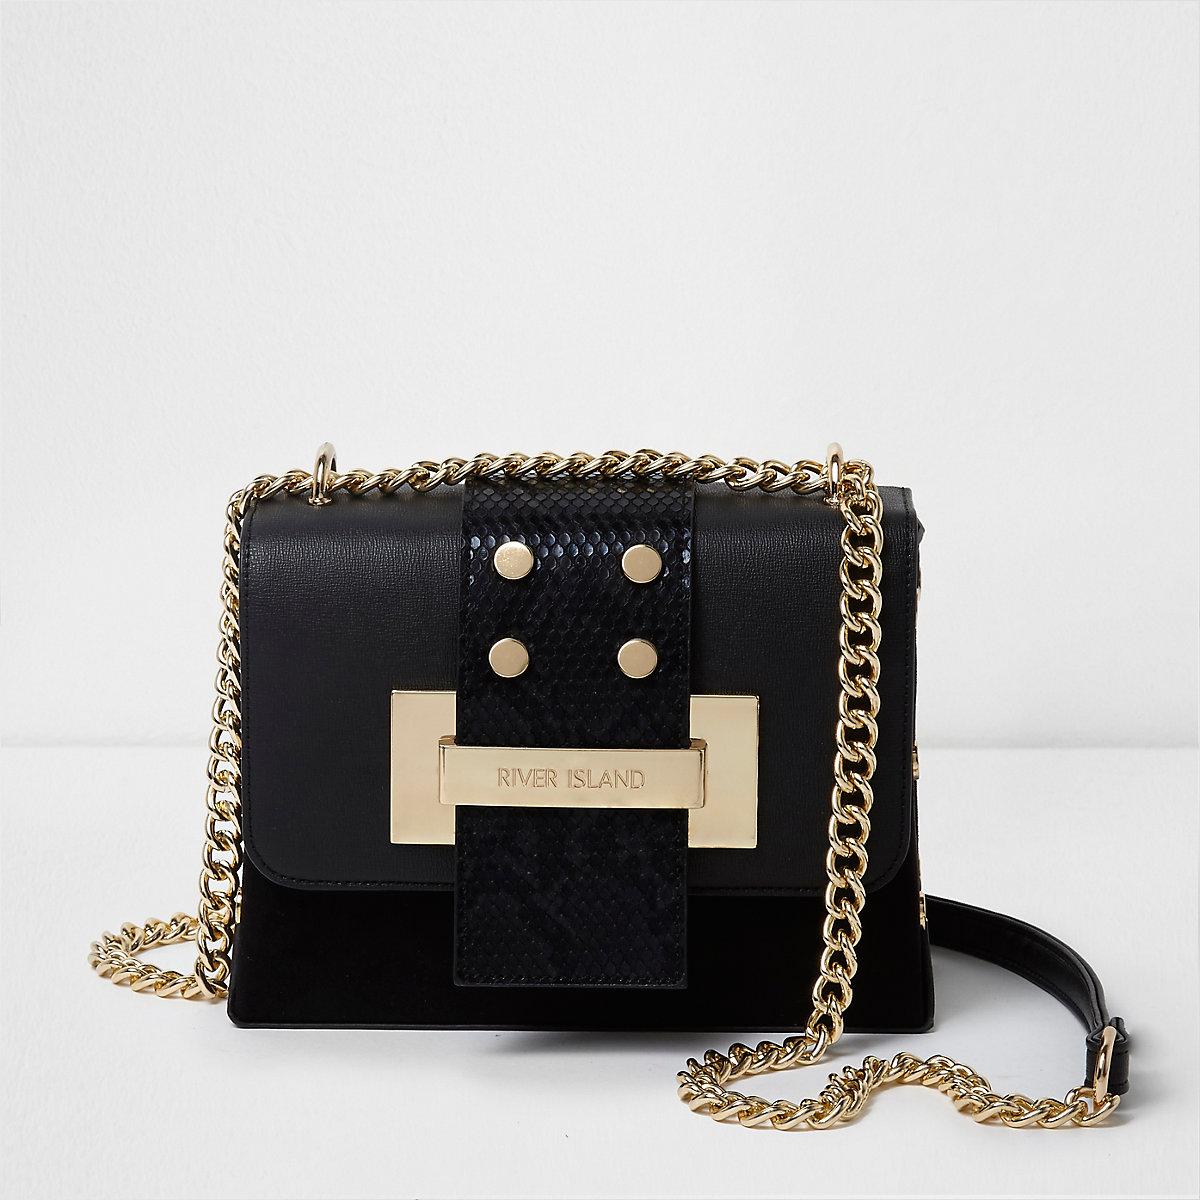 Black and gold tone chain cross body bag